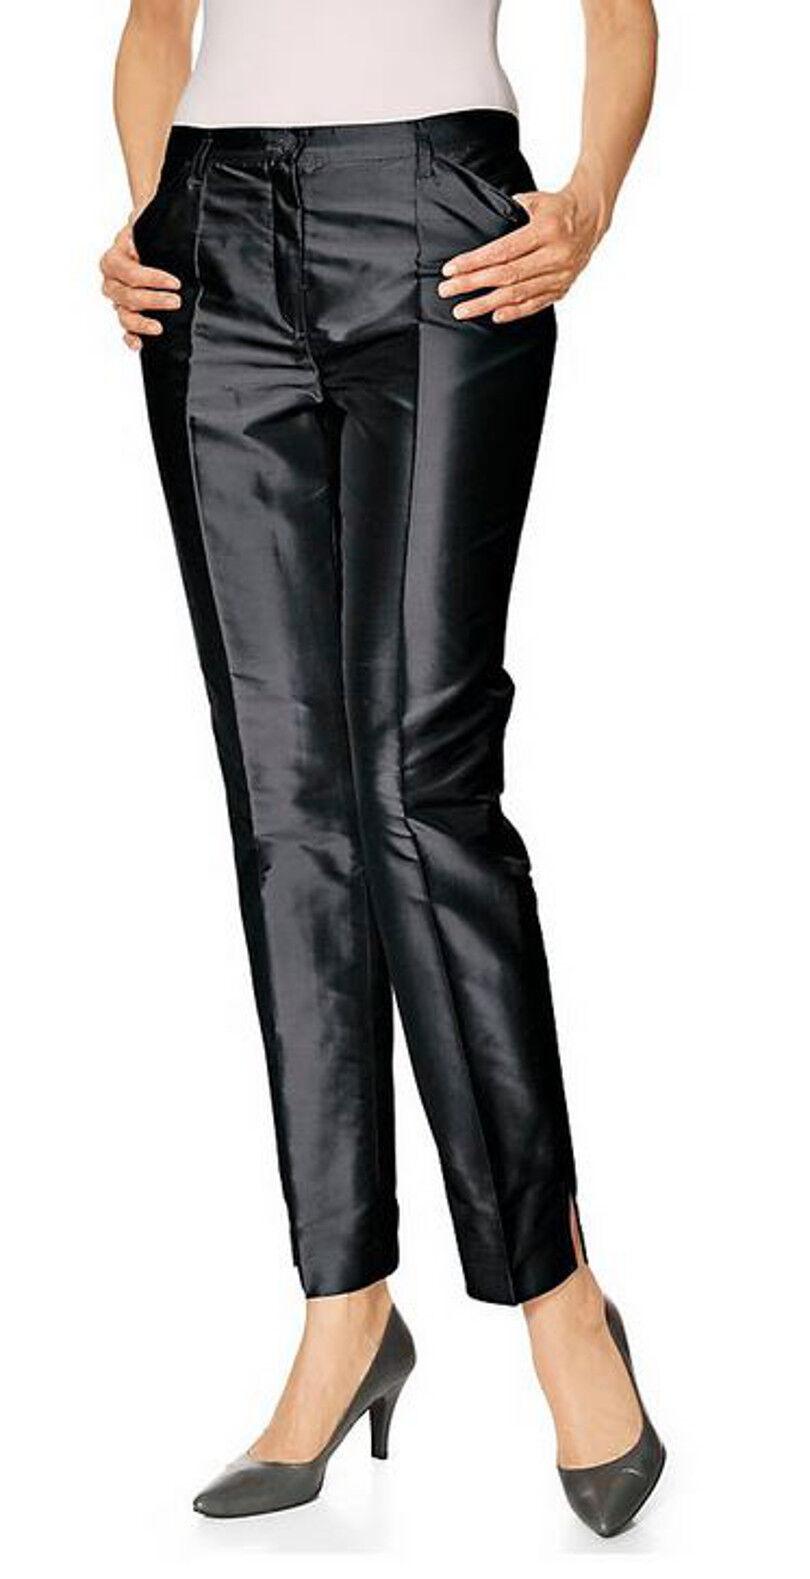 Seidenhose schwarz 36 SINGH SINGH SINGH S.MADAN Heine 100% Seide Wildseide elegant NP e63916